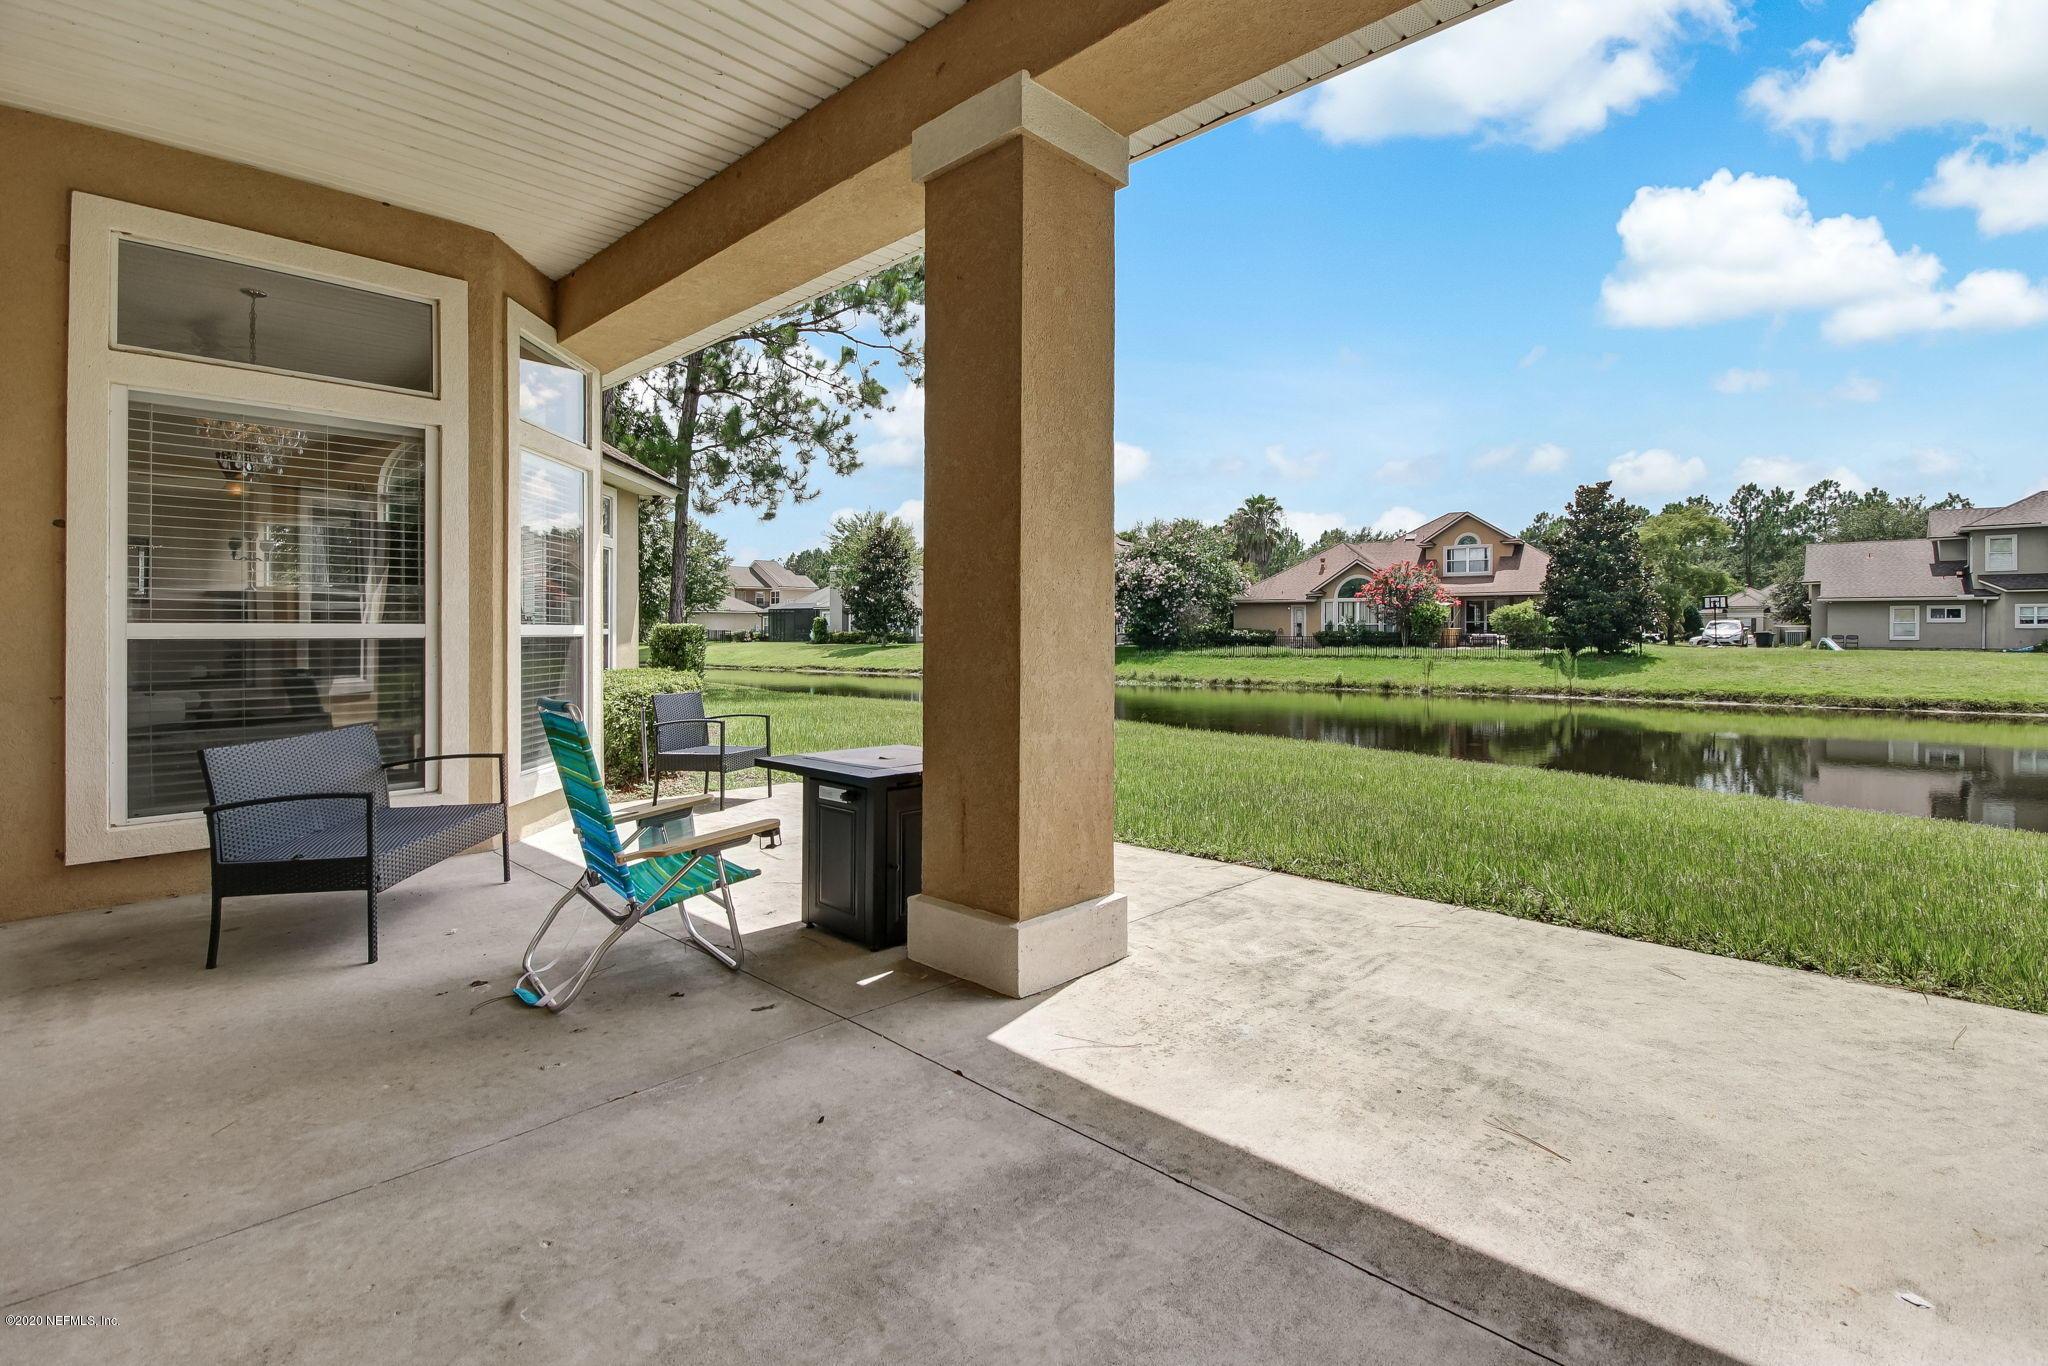 1426 BLACK PINE, ORANGE PARK, FLORIDA 32065, 5 Bedrooms Bedrooms, ,4 BathroomsBathrooms,Residential,For sale,BLACK PINE,1060727